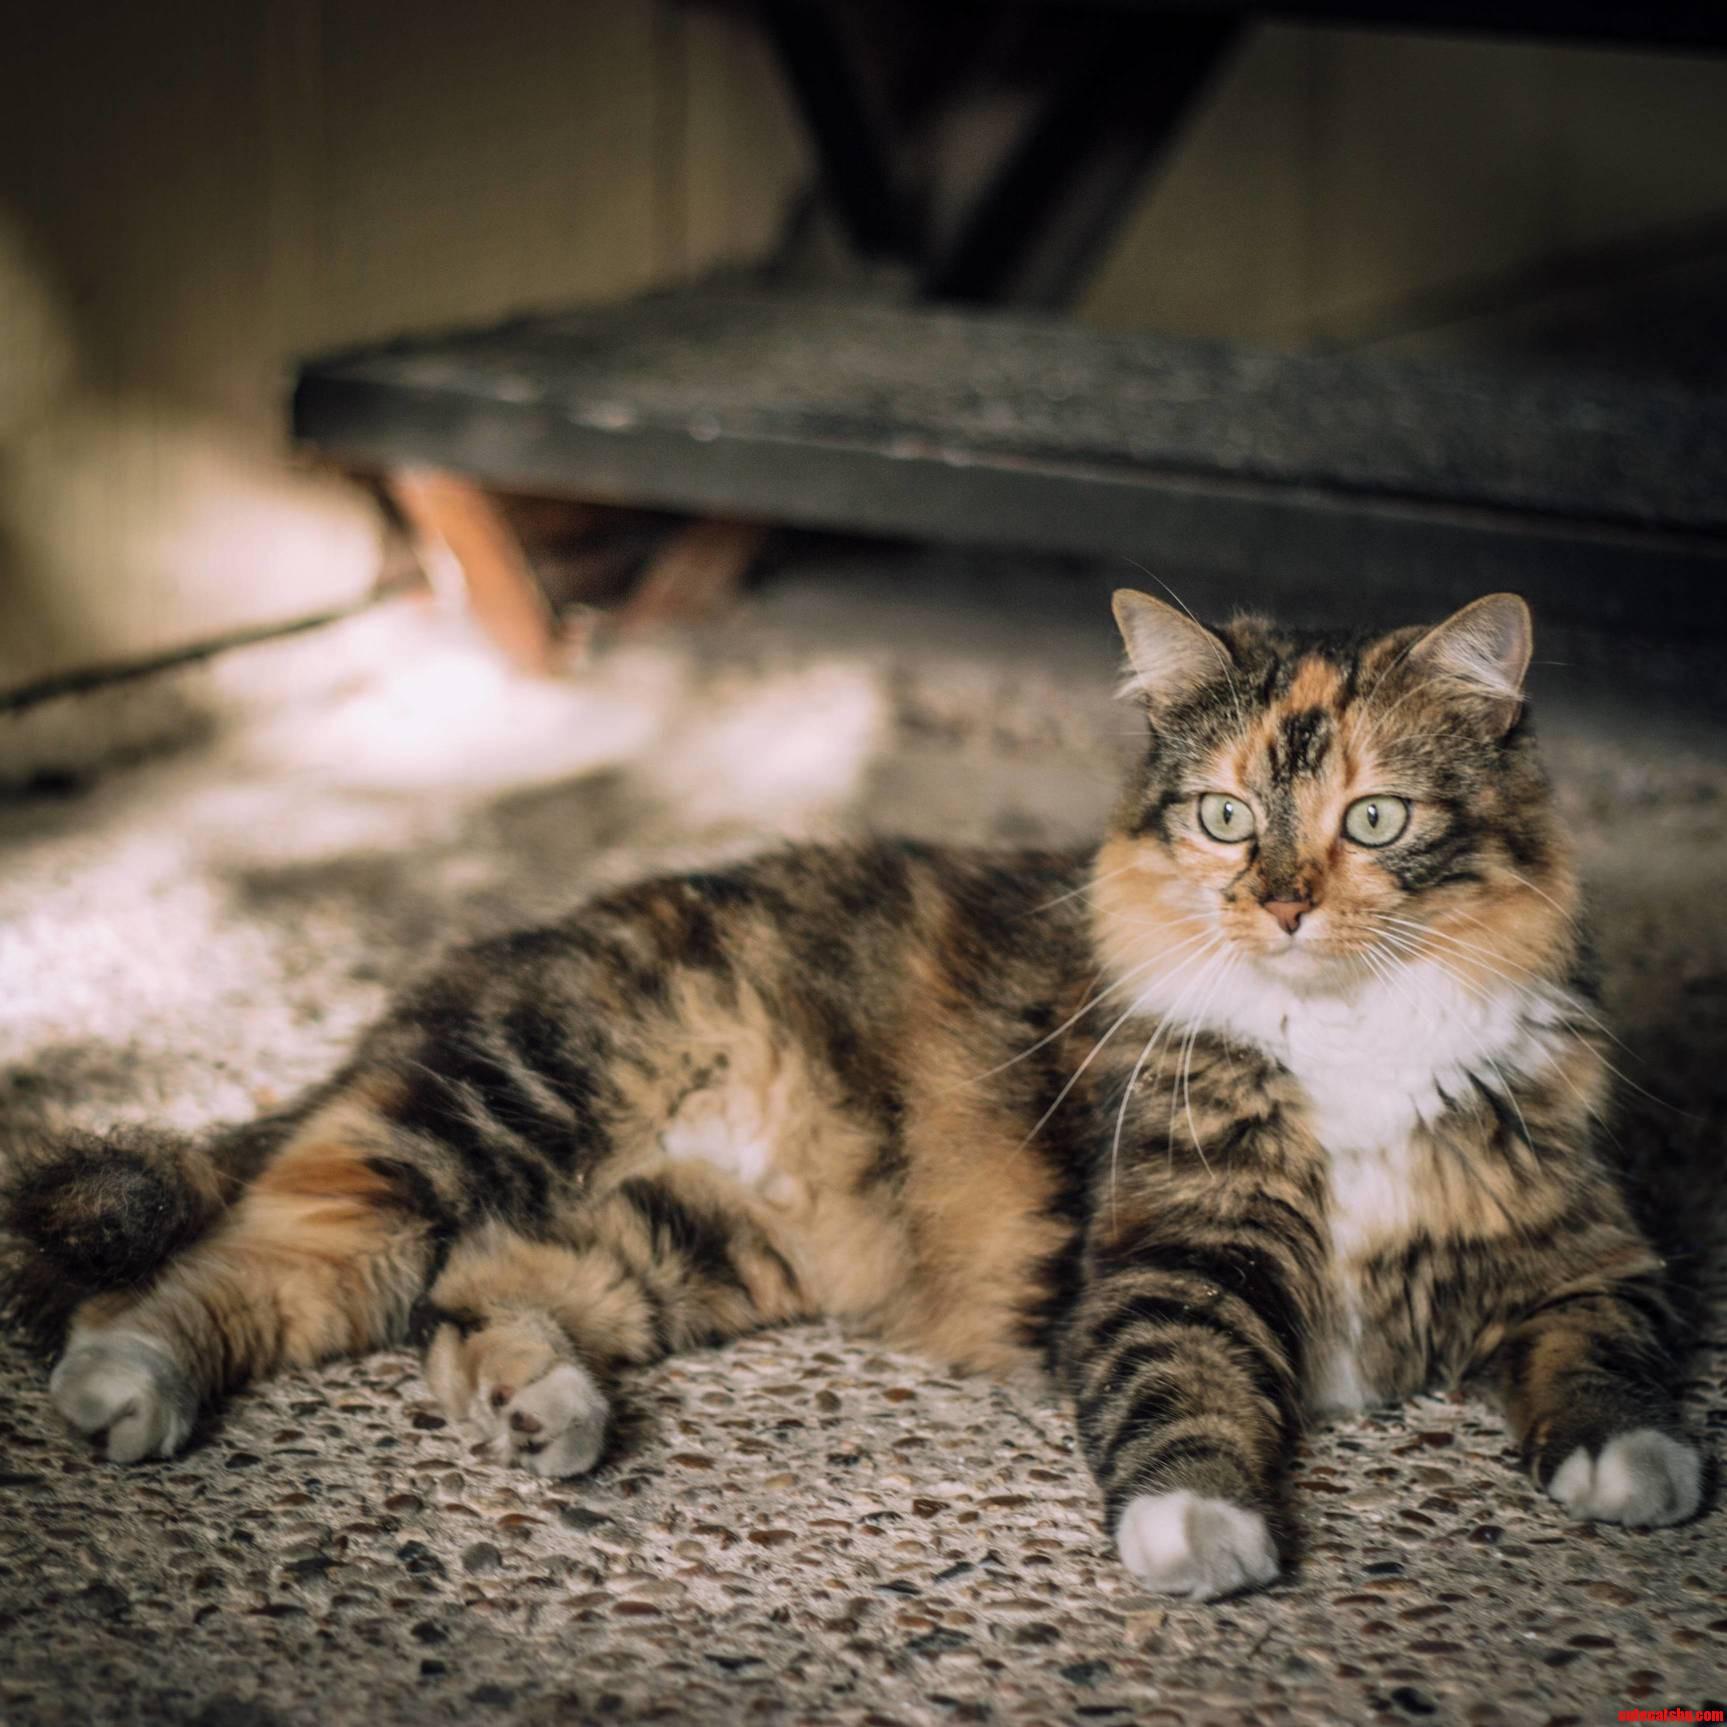 The Neighborhood Kitty…She Likes To Roll Around